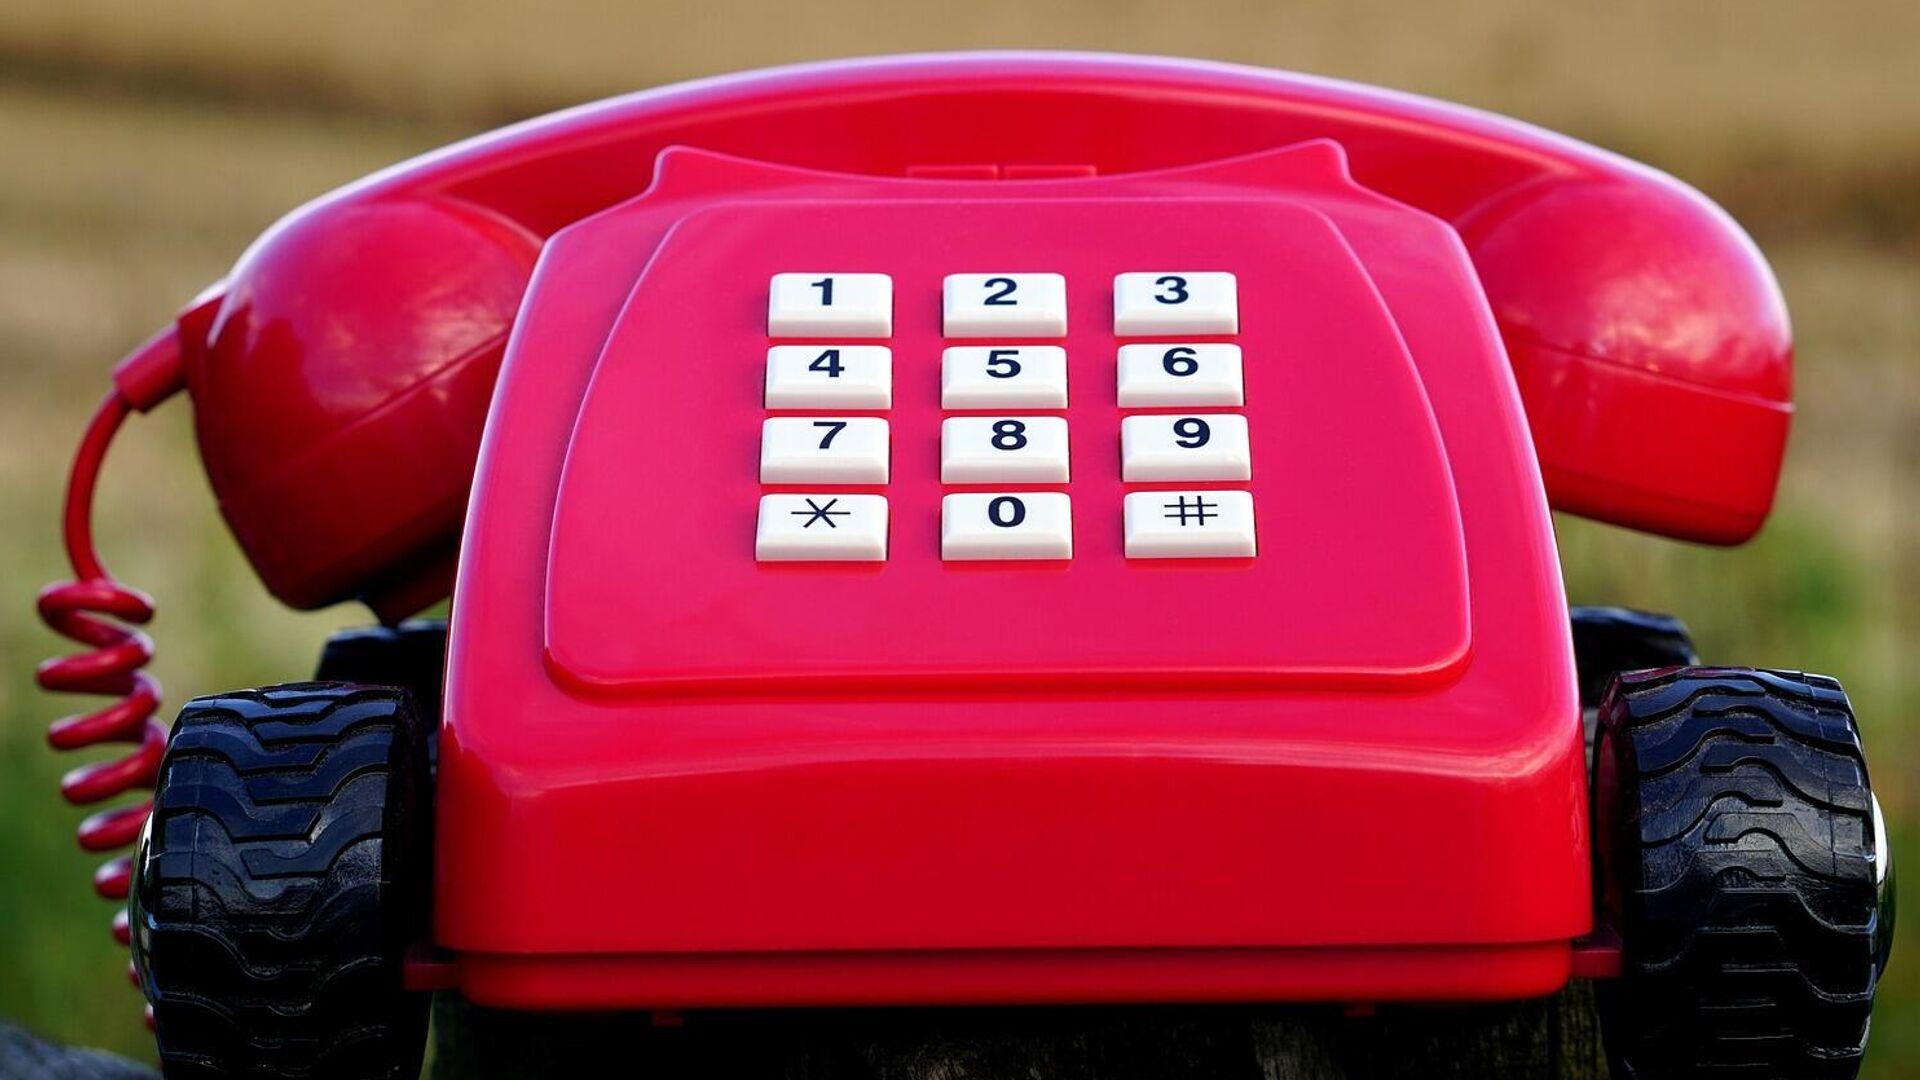 Un teléfono rojo (imagen referencial) - Sputnik Mundo, 1920, 15.07.2021